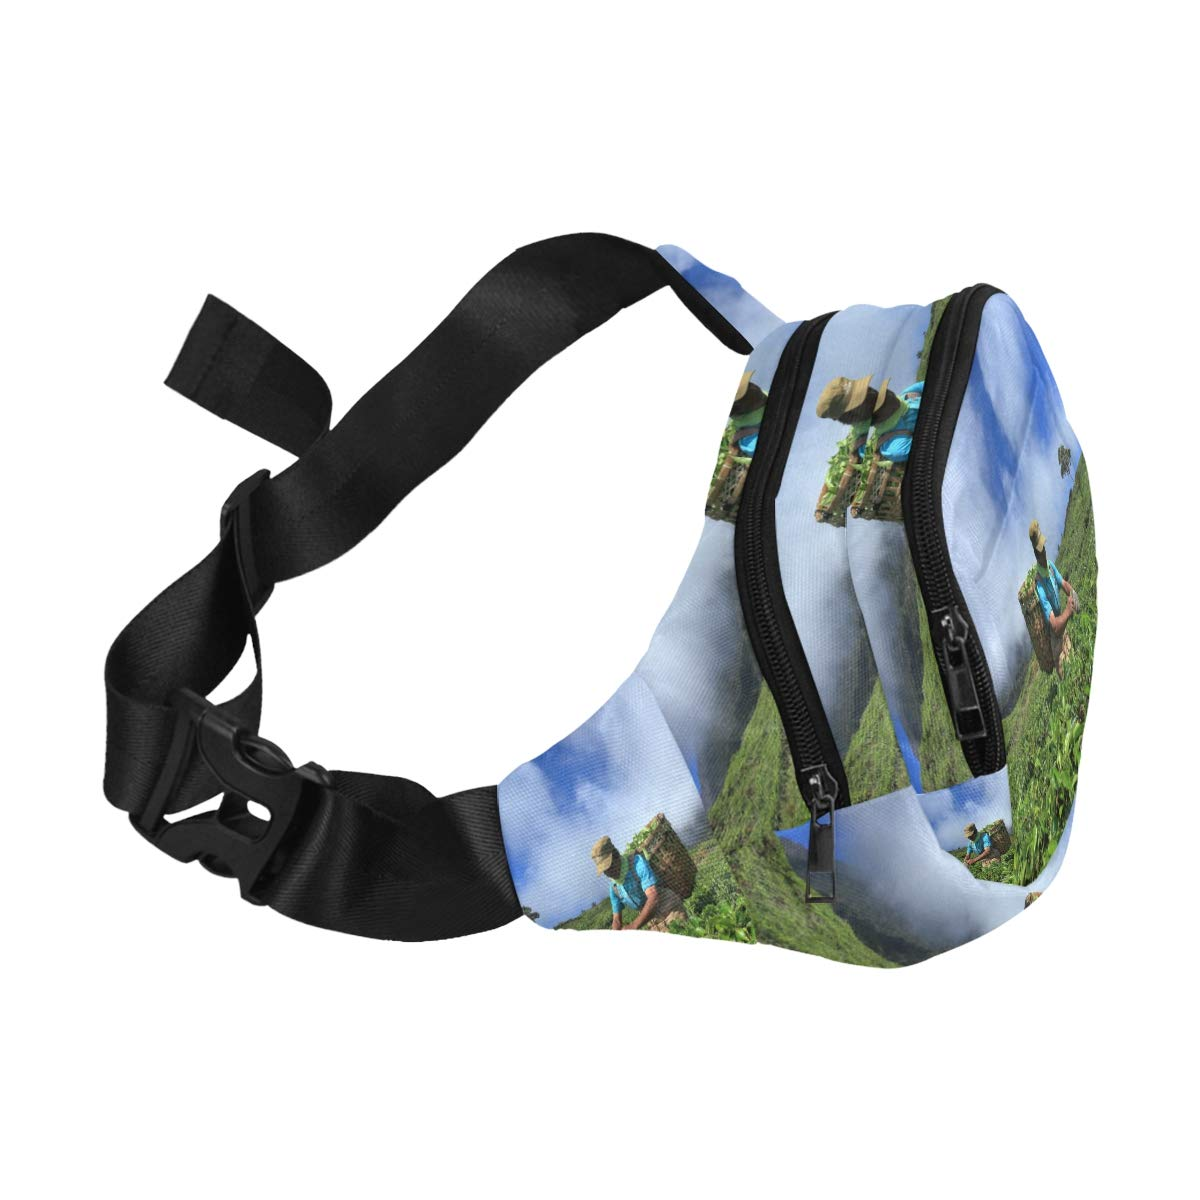 Women Pick In Tea Leaves Fenny Packs Waist Bags Adjustable Belt Waterproof Nylon Travel Running Sport Vacation Party For Men Women Boys Girls Kids